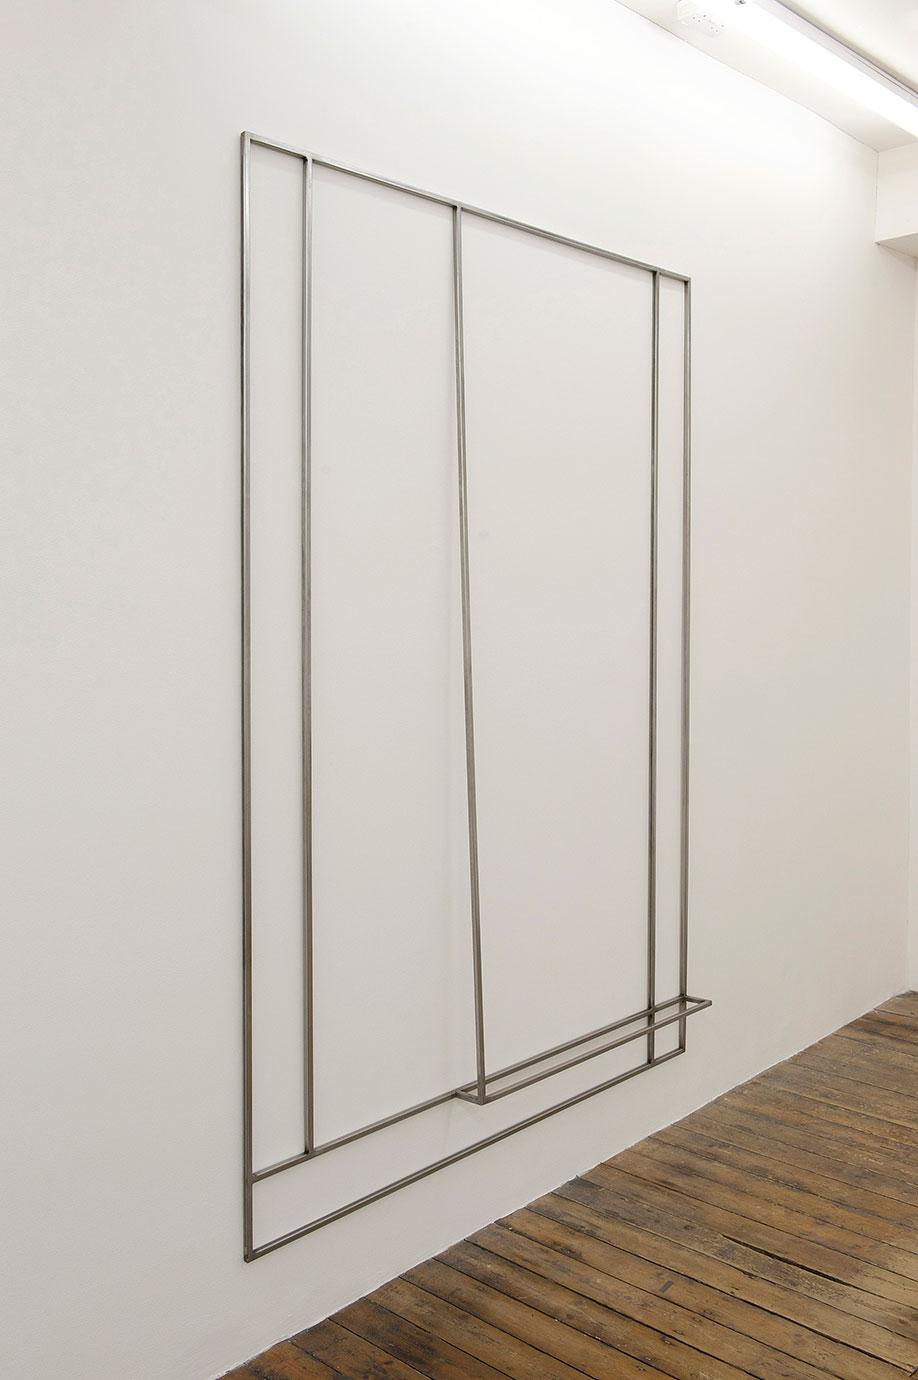 <b>Title:</b>Untitled (Margins)<br /><b>Year:</b>2011<br /><b>Medium:</b>Mild steel<br /><b>Size:</b>203 x 140 x 9 cm